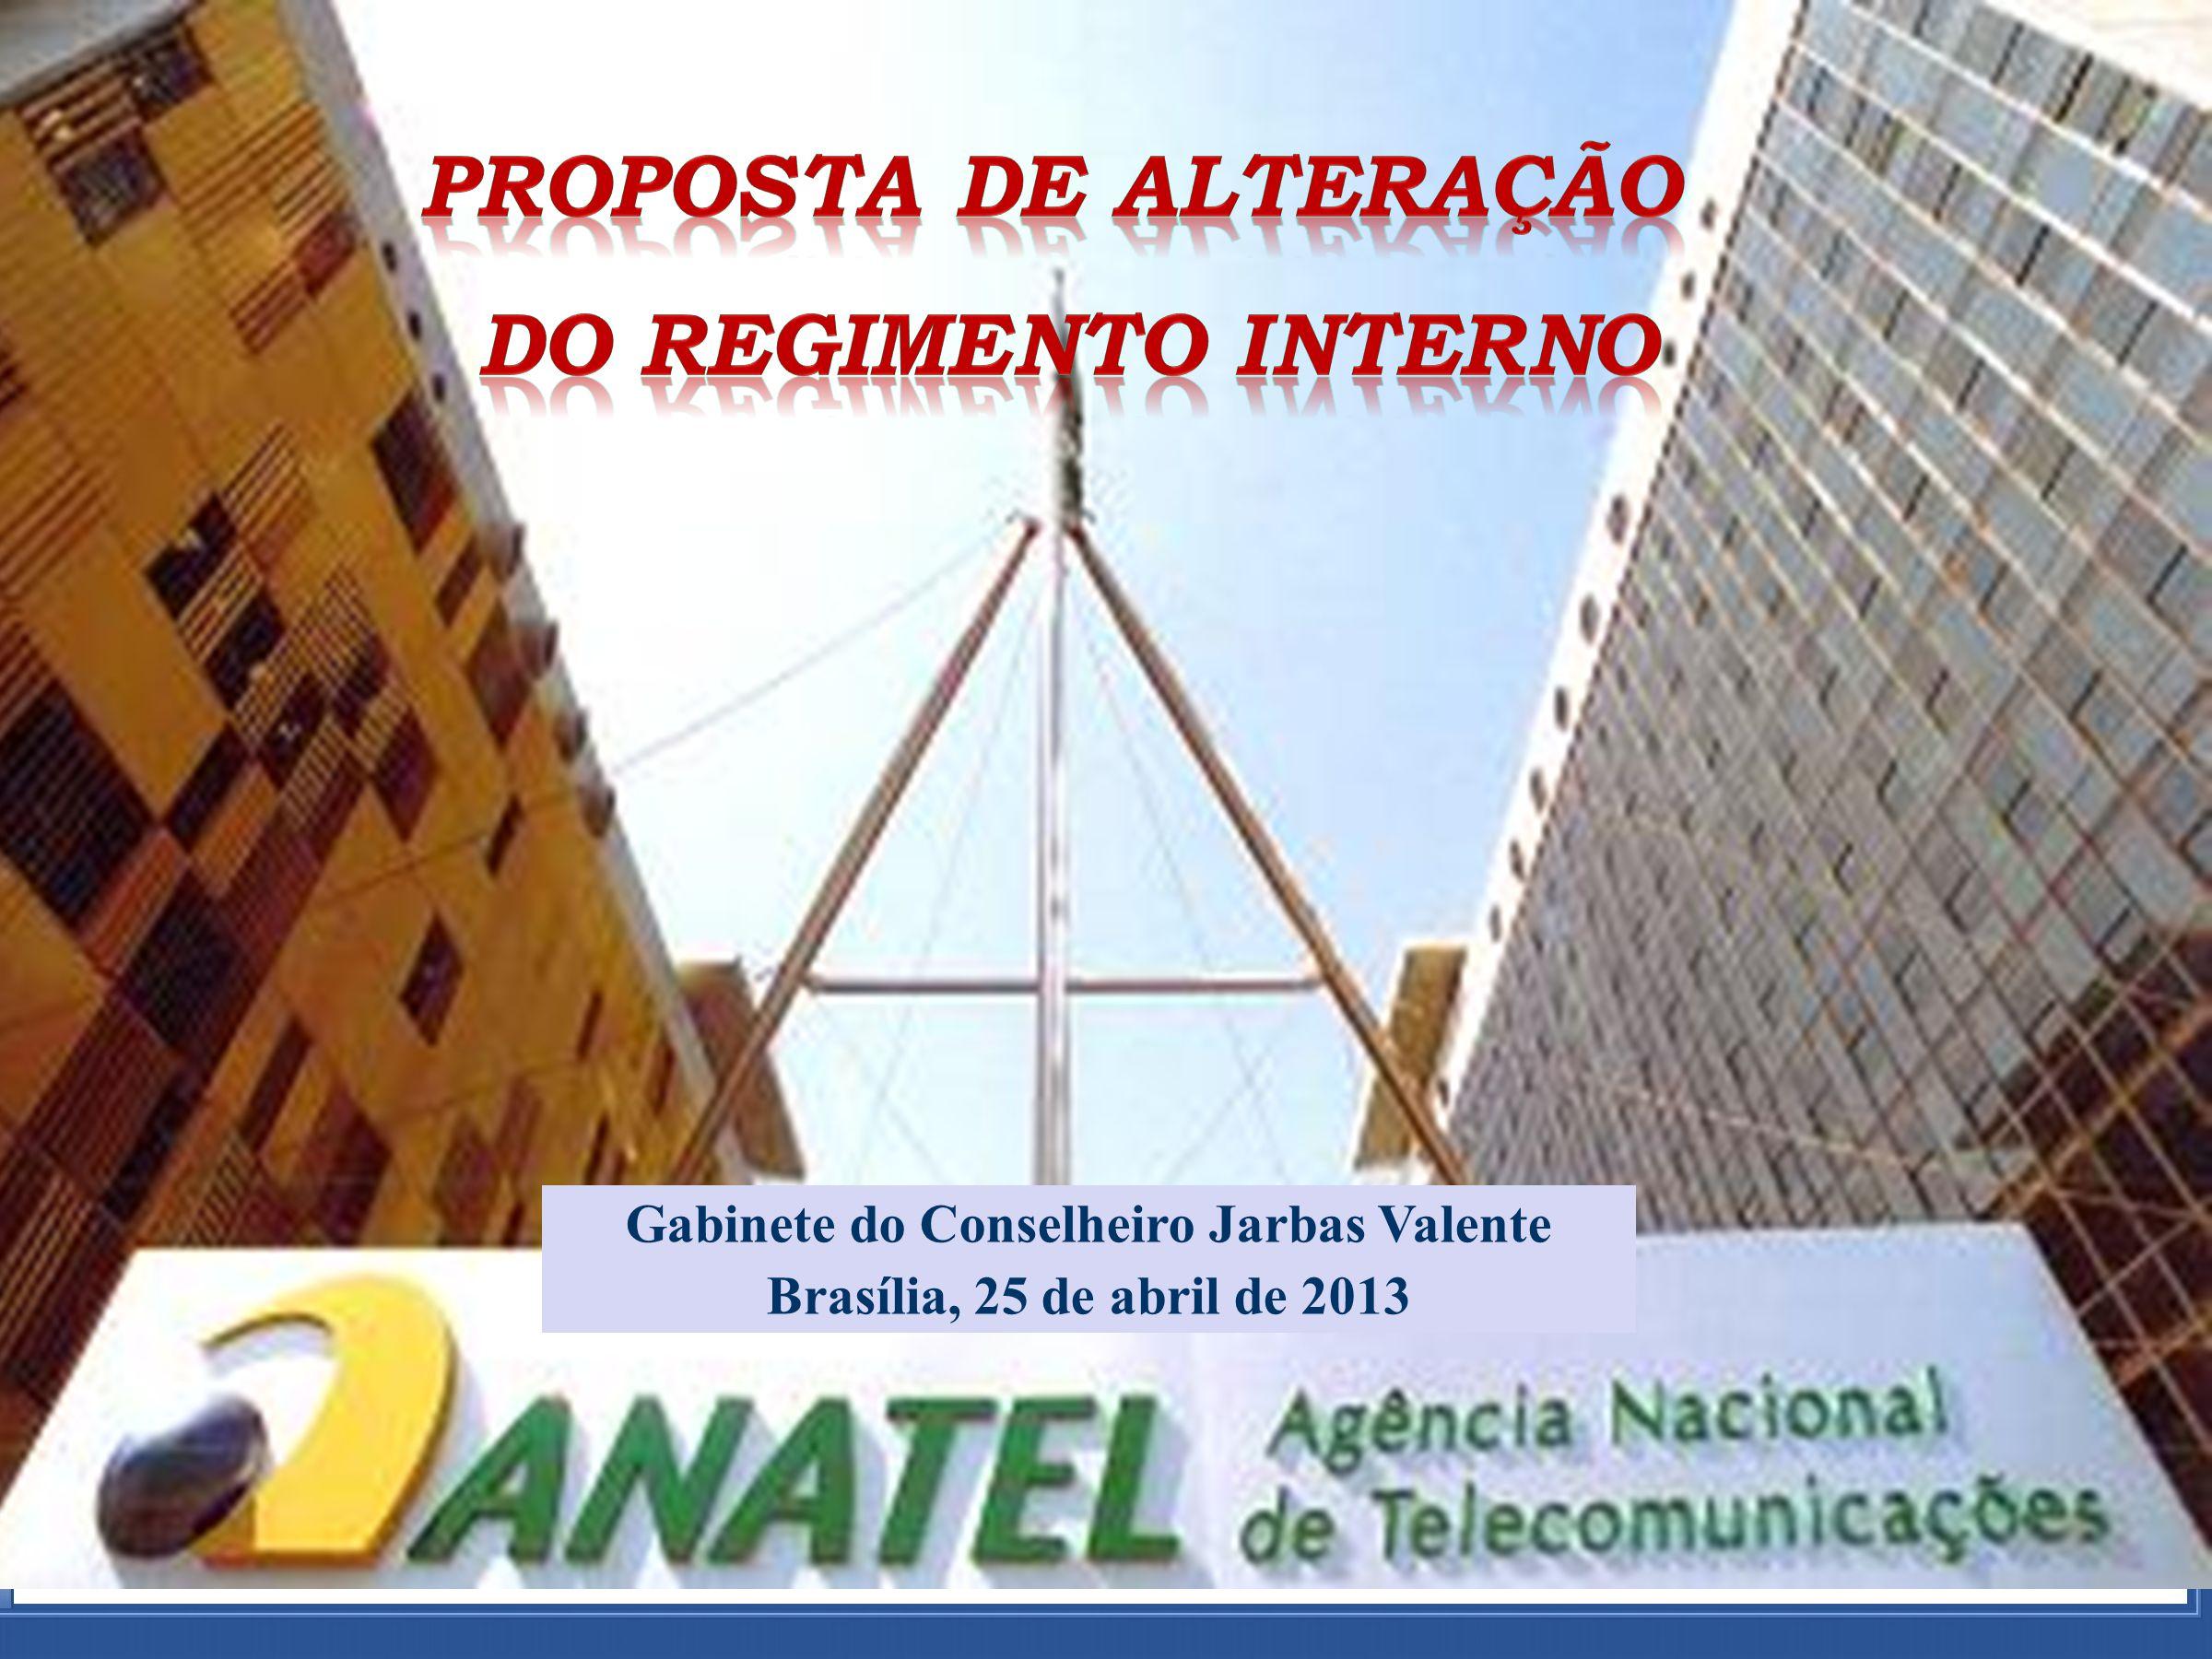 ADTOD Parte Processual Gabinete do Conselheiro Jarbas Valente Brasília, 25 de abril de 2013